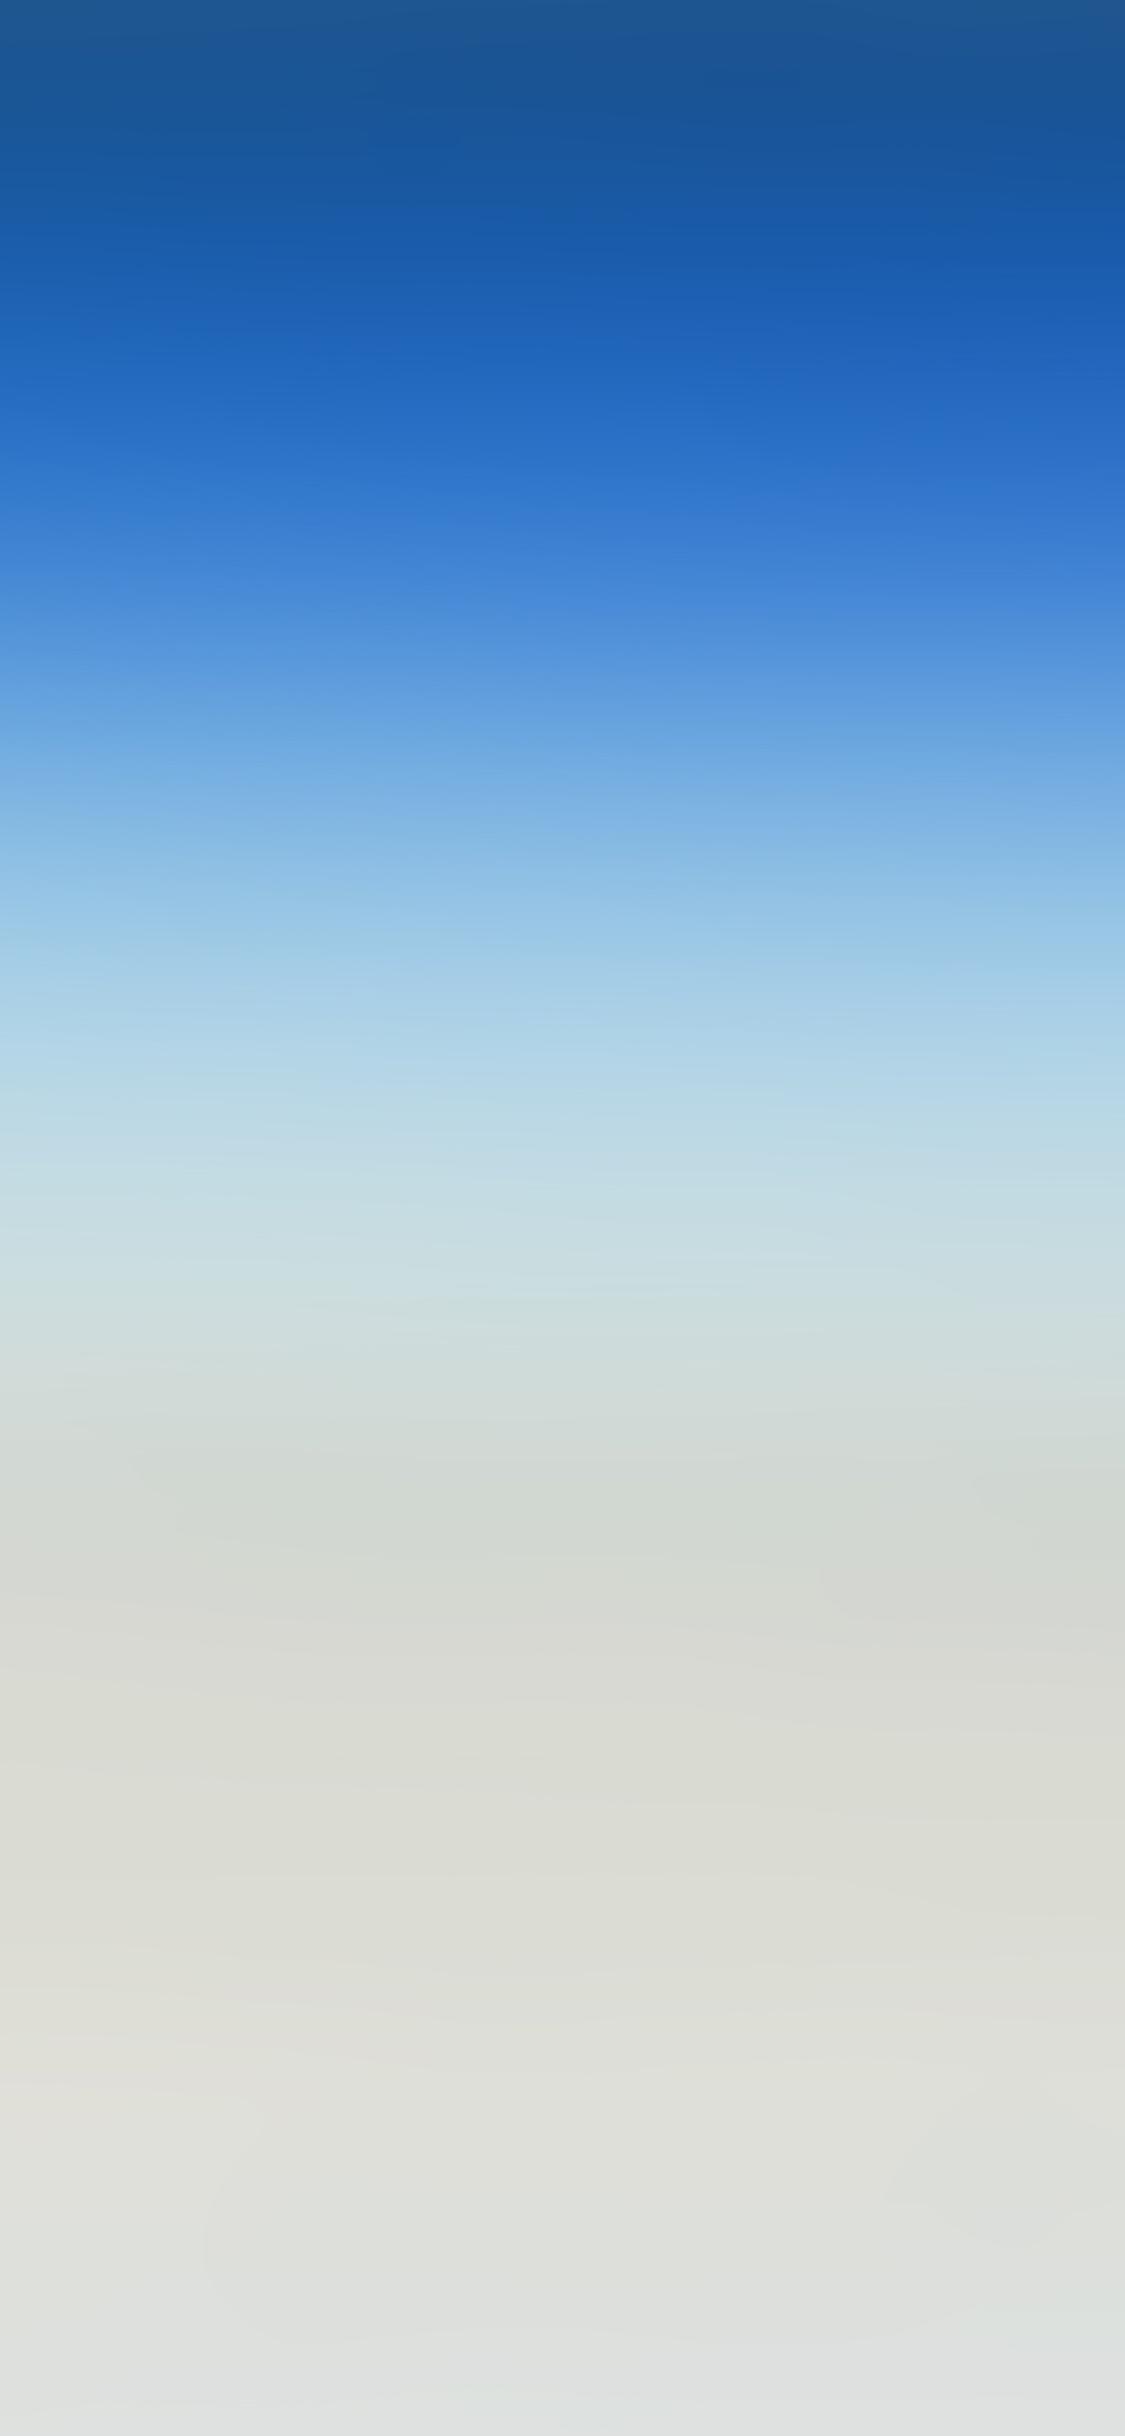 iPhoneXpapers.com-Apple-iPhone-wallpaper-sl45-blue-sea-blur-gradation